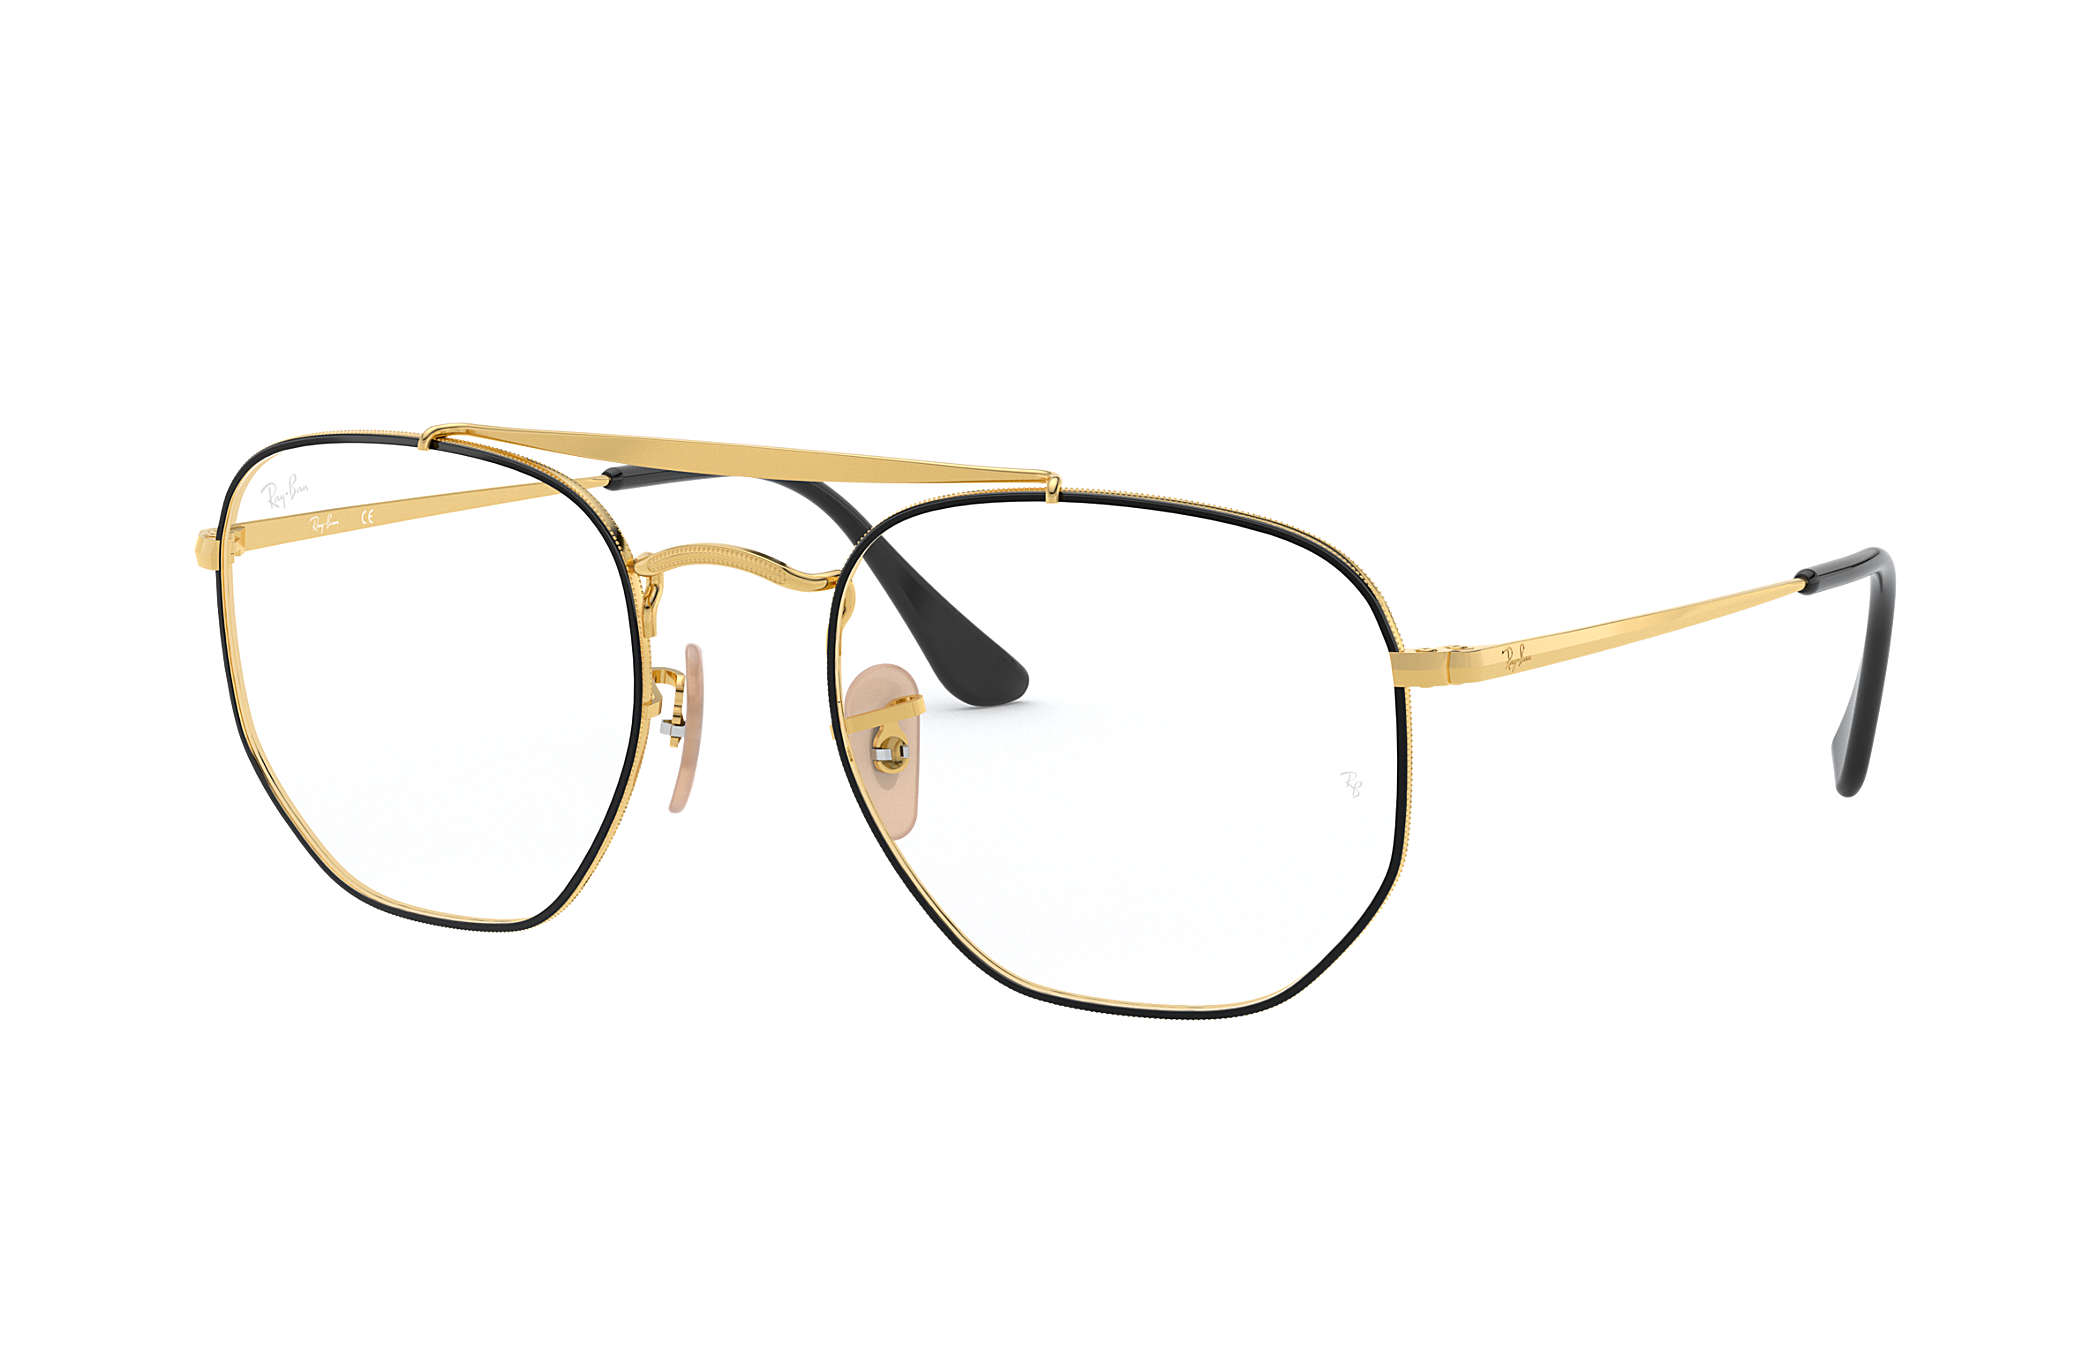 983098e69e4 Ray-Ban prescription glasses Marshal Optics RB3648V Black - Metal ...